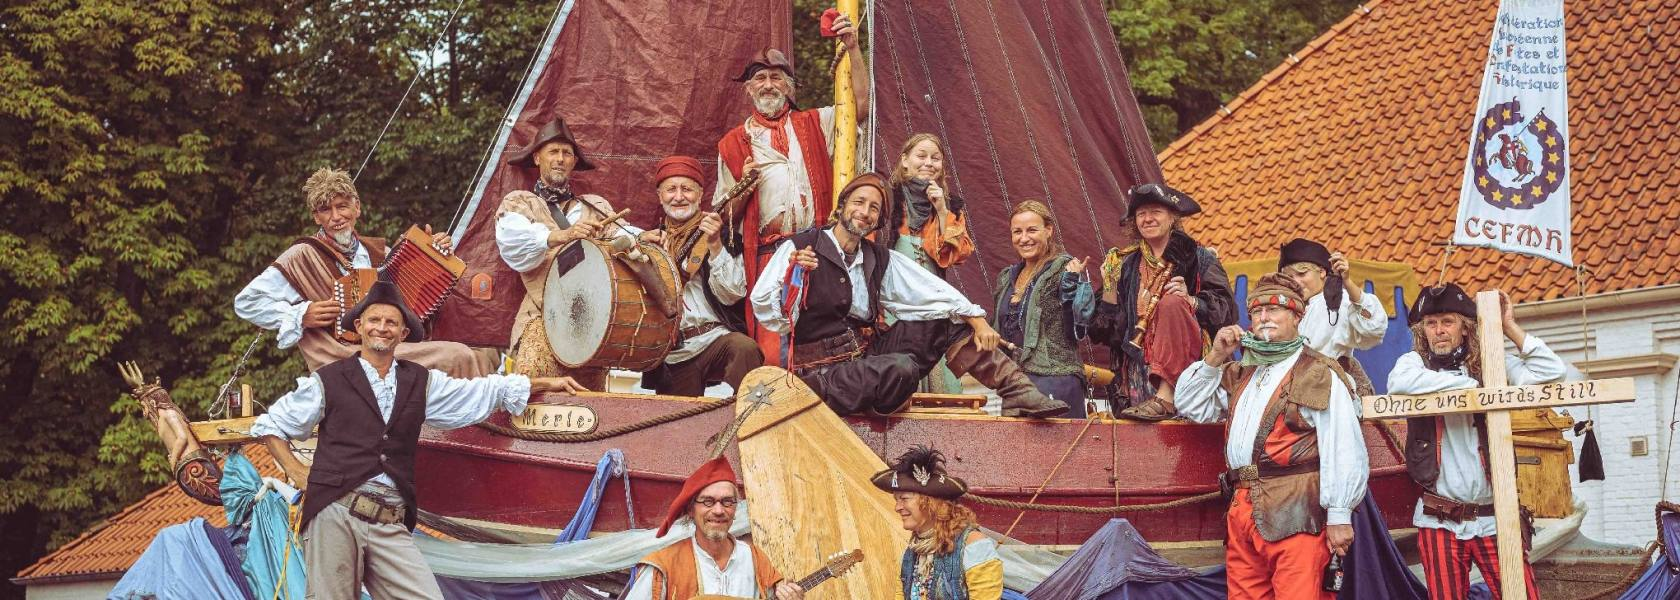 Ritterfest Dornum, © #twojport (Jonas Schmidt)